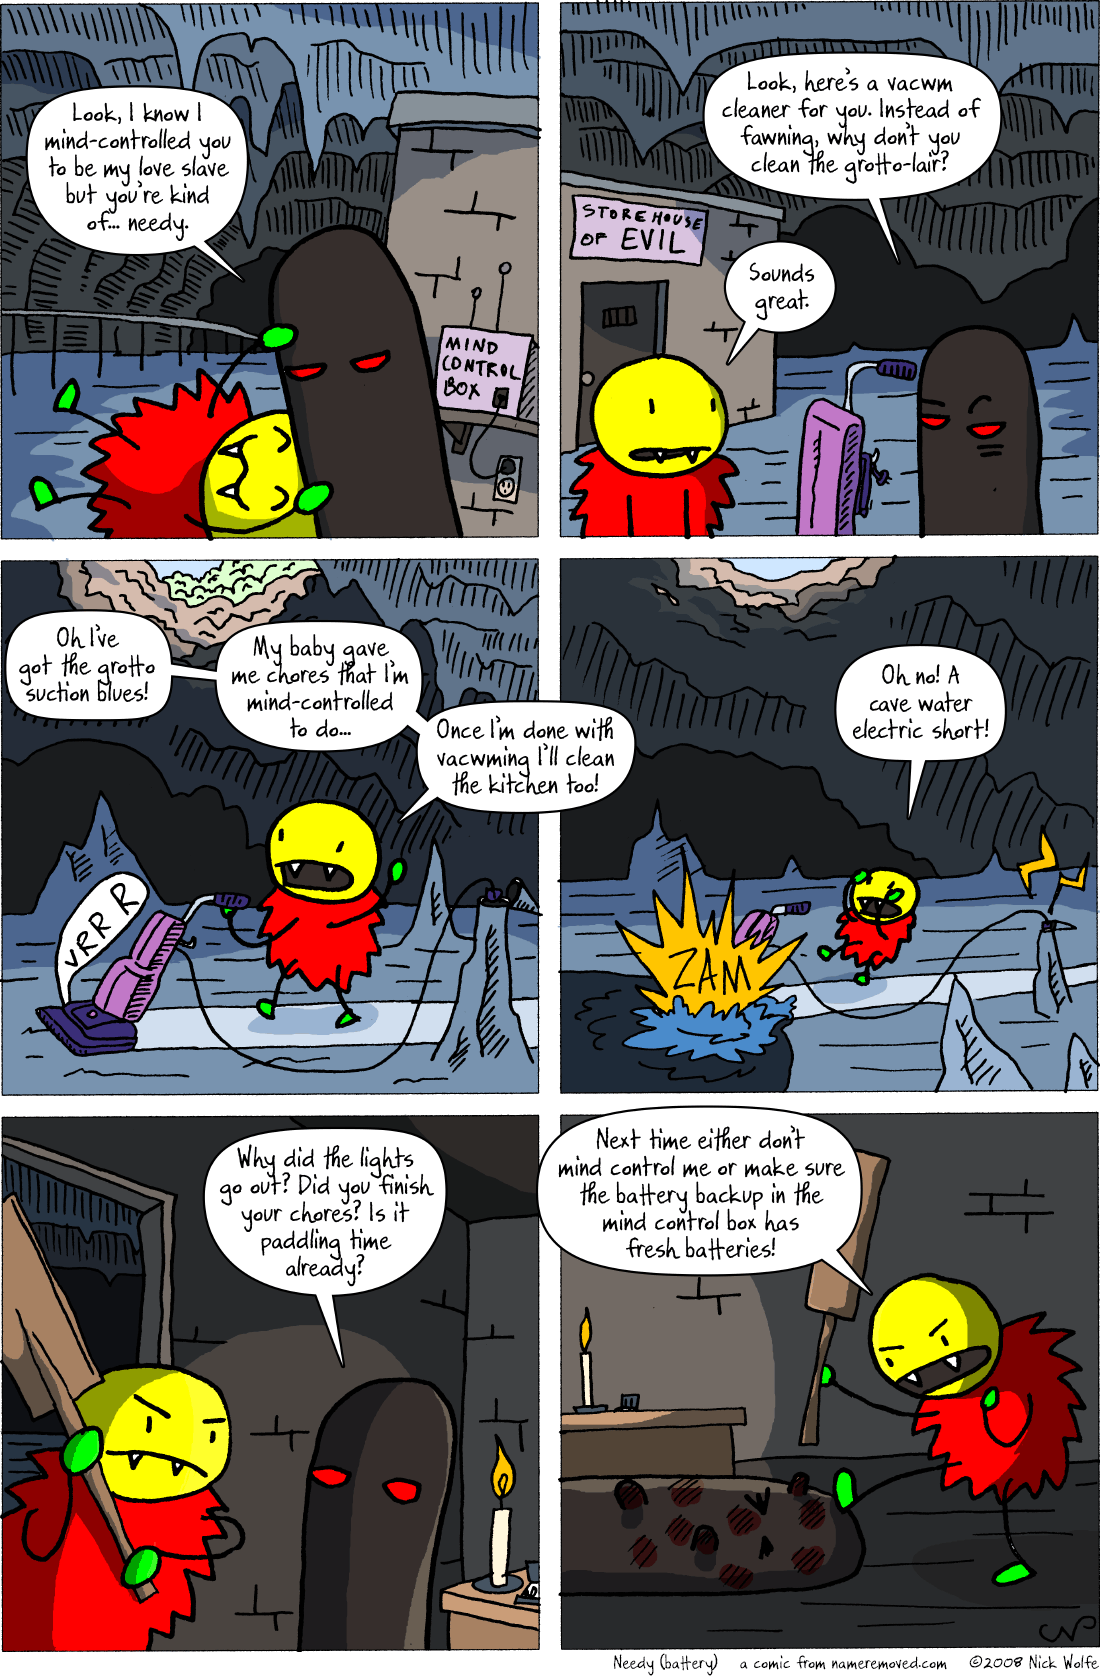 Needy (battery)